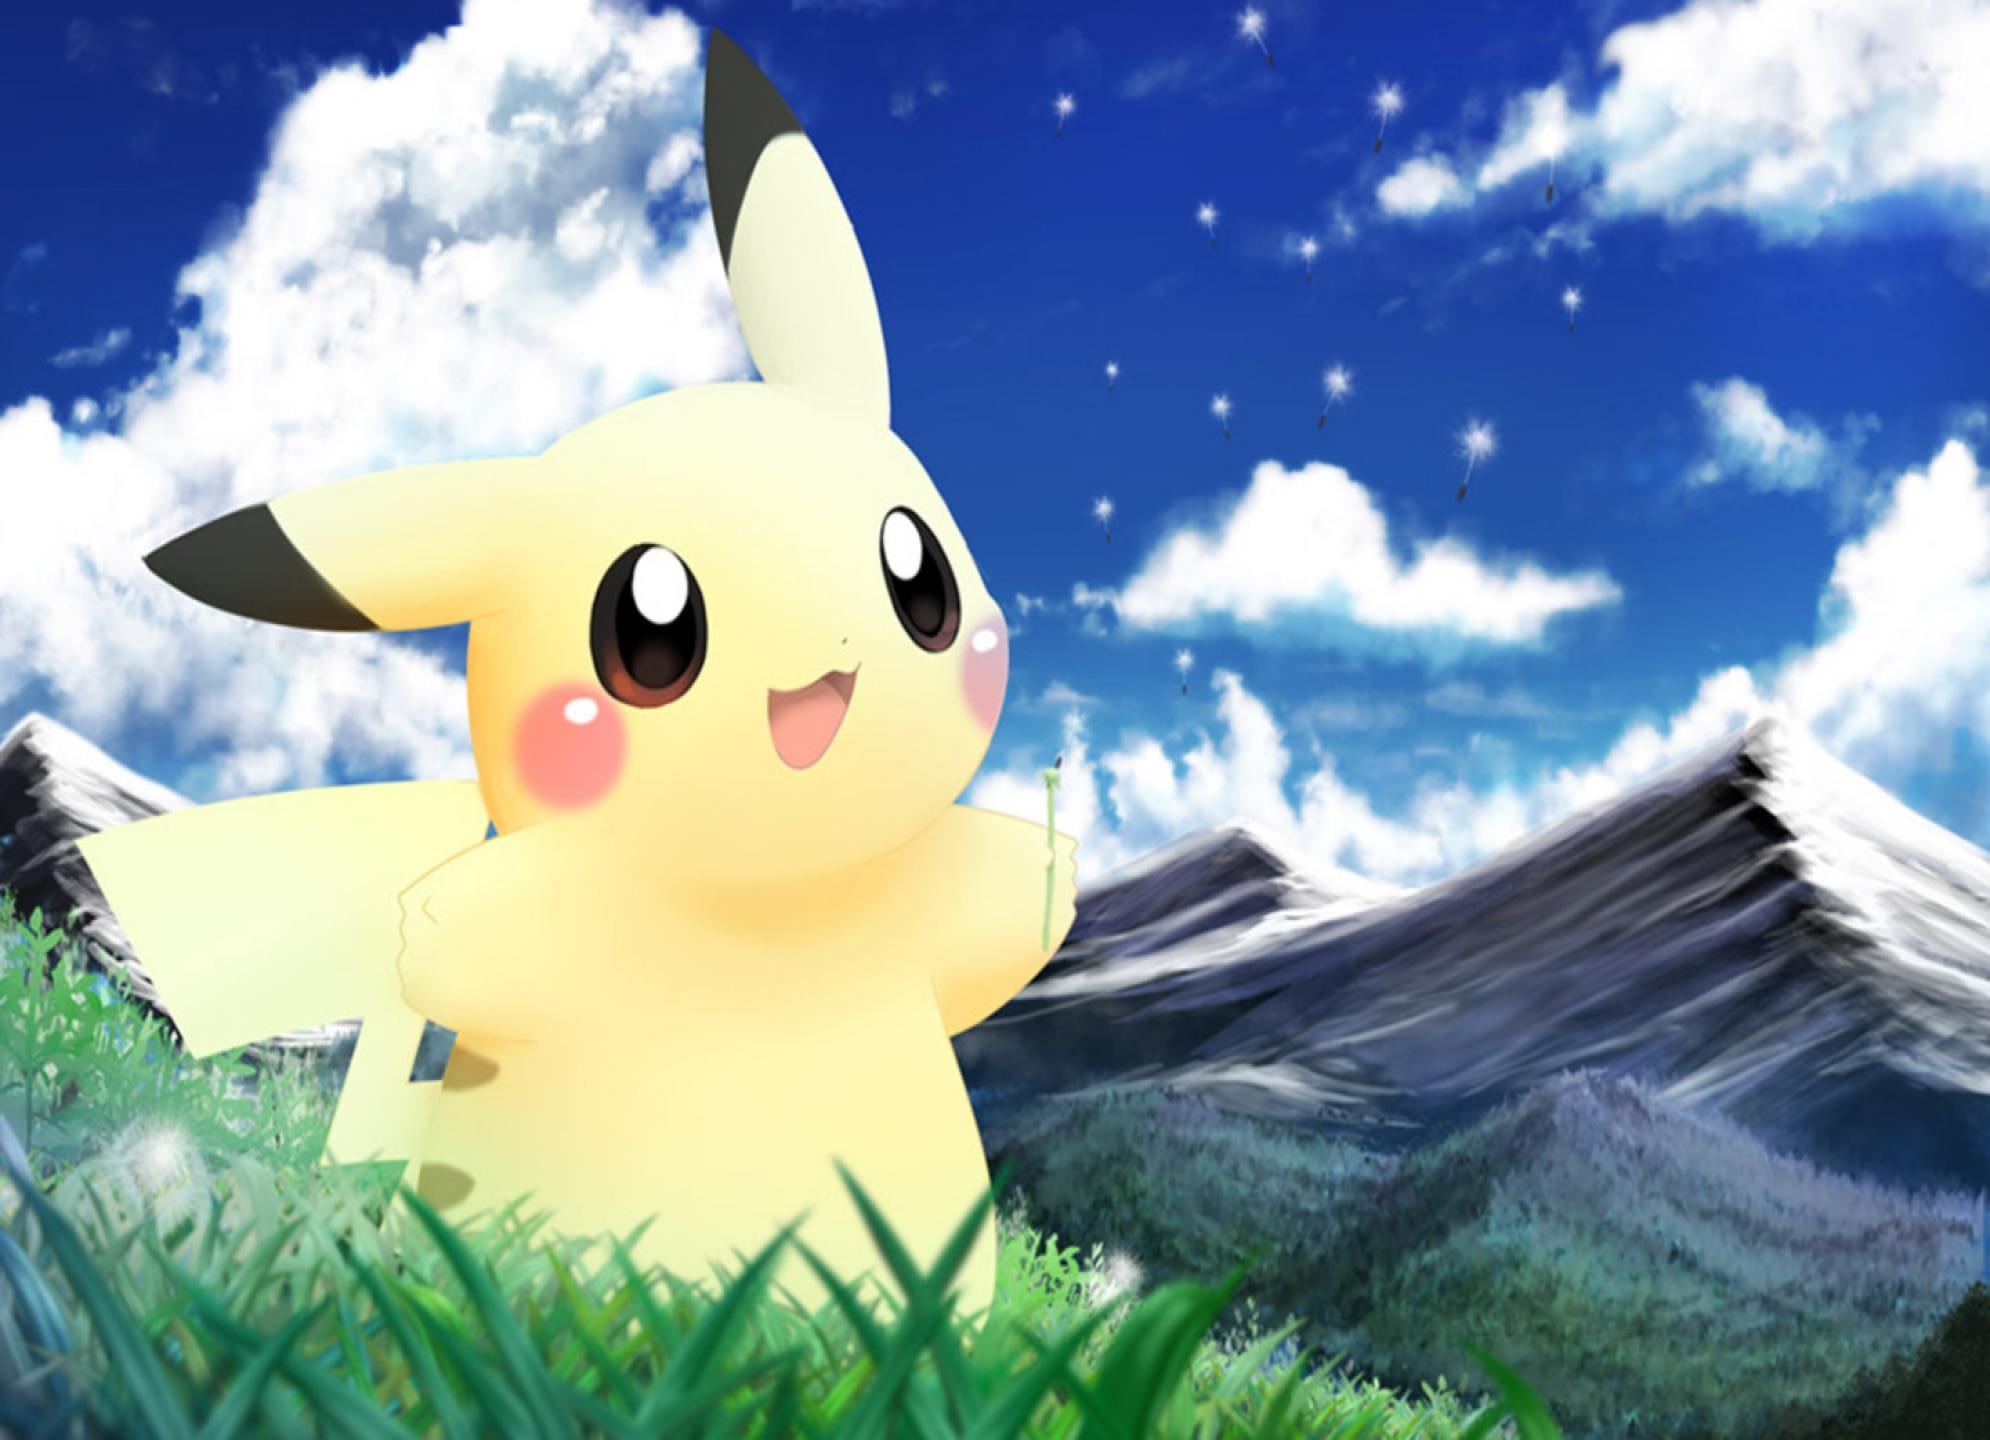 Cute Pikachu Wallpaper   cute-pikachu-wallpaper-5119-hd-wallpapers .